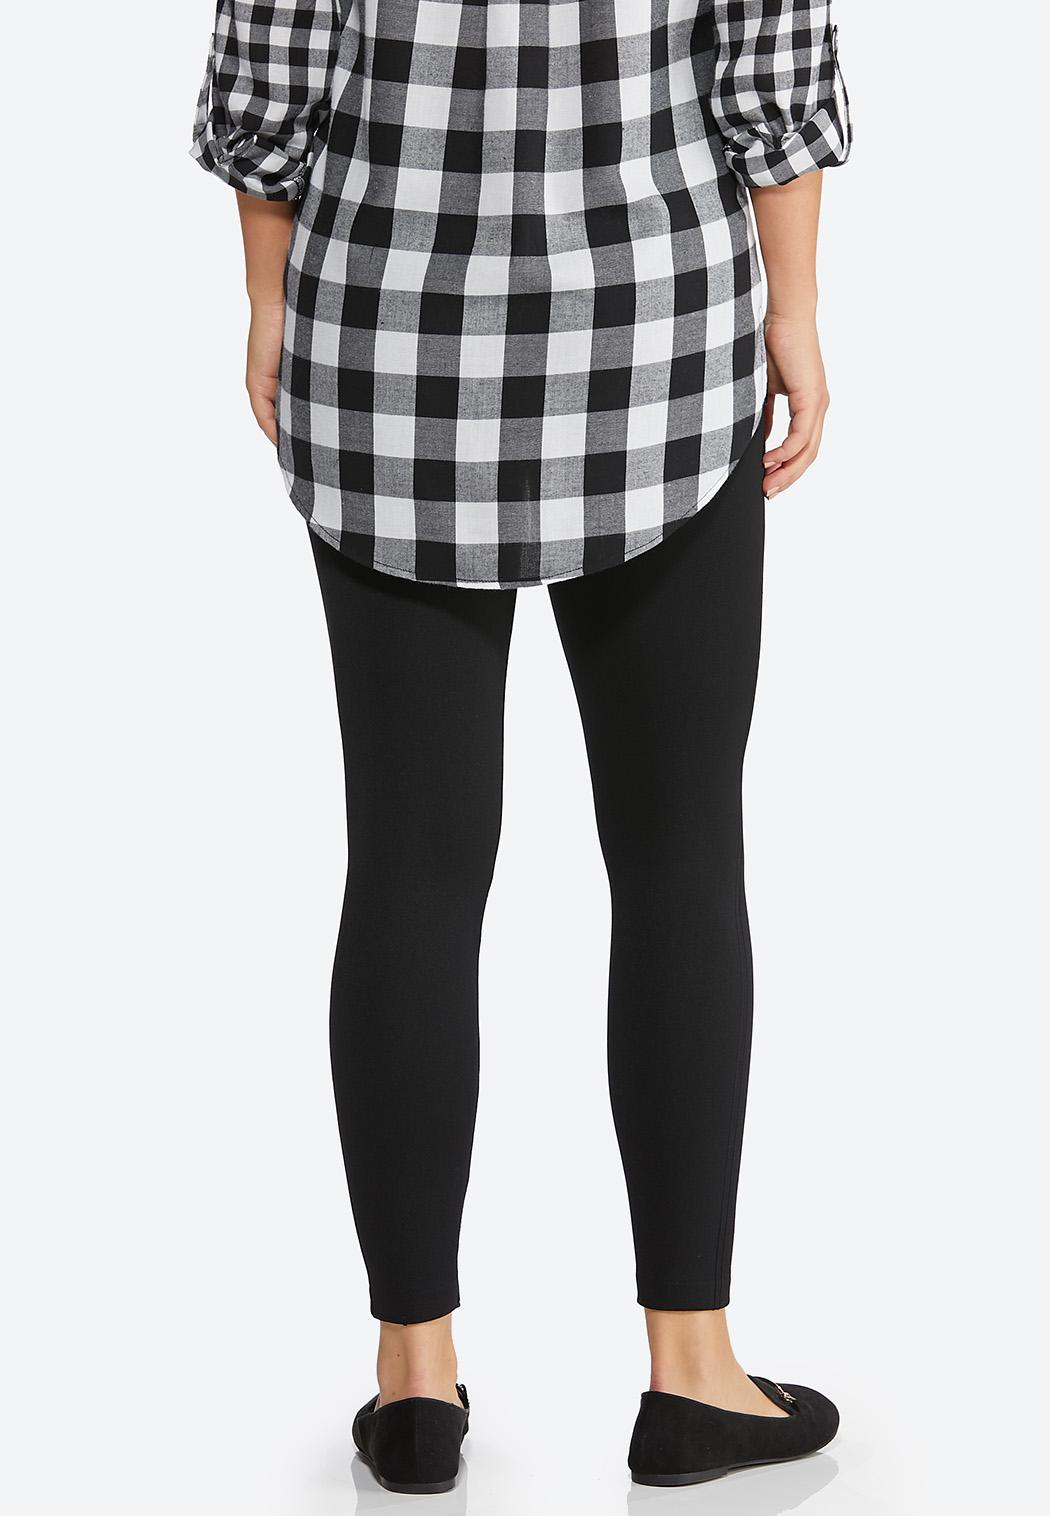 Solid Fleece Lined Leggings (Item #44384893)